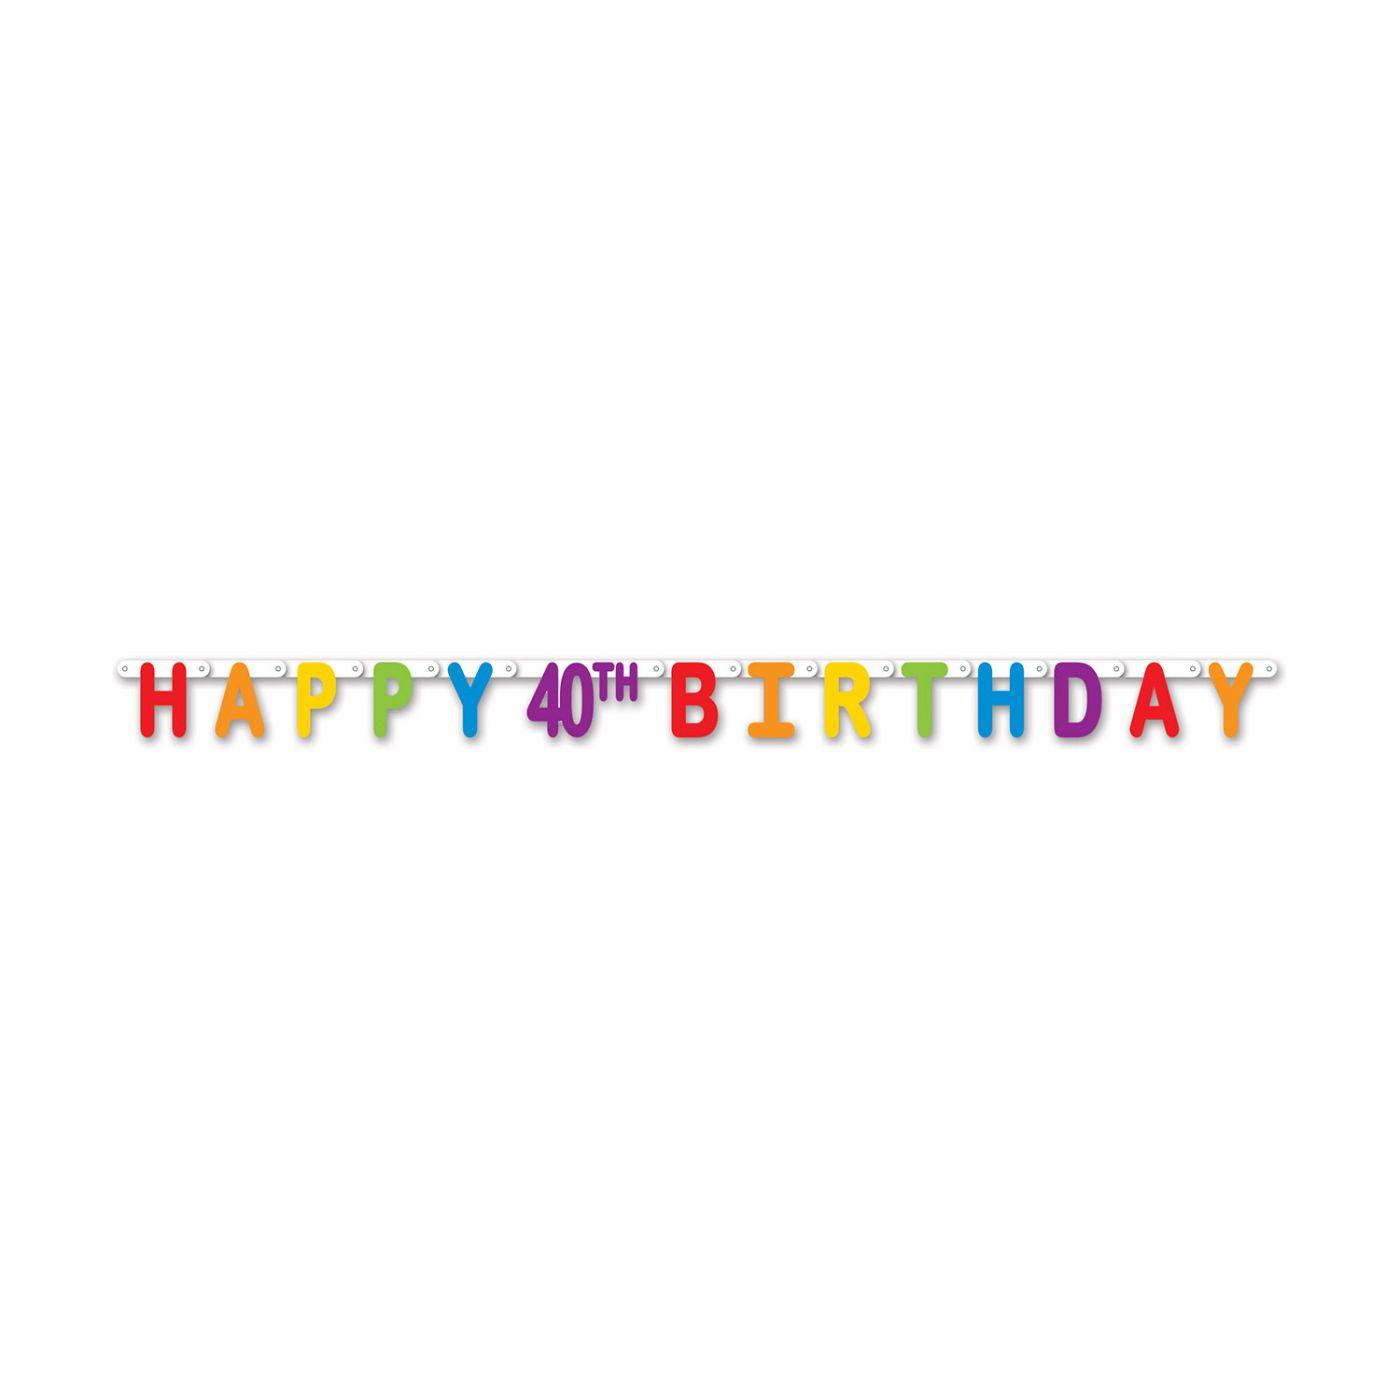 Happy 40th Birthday Streamer image